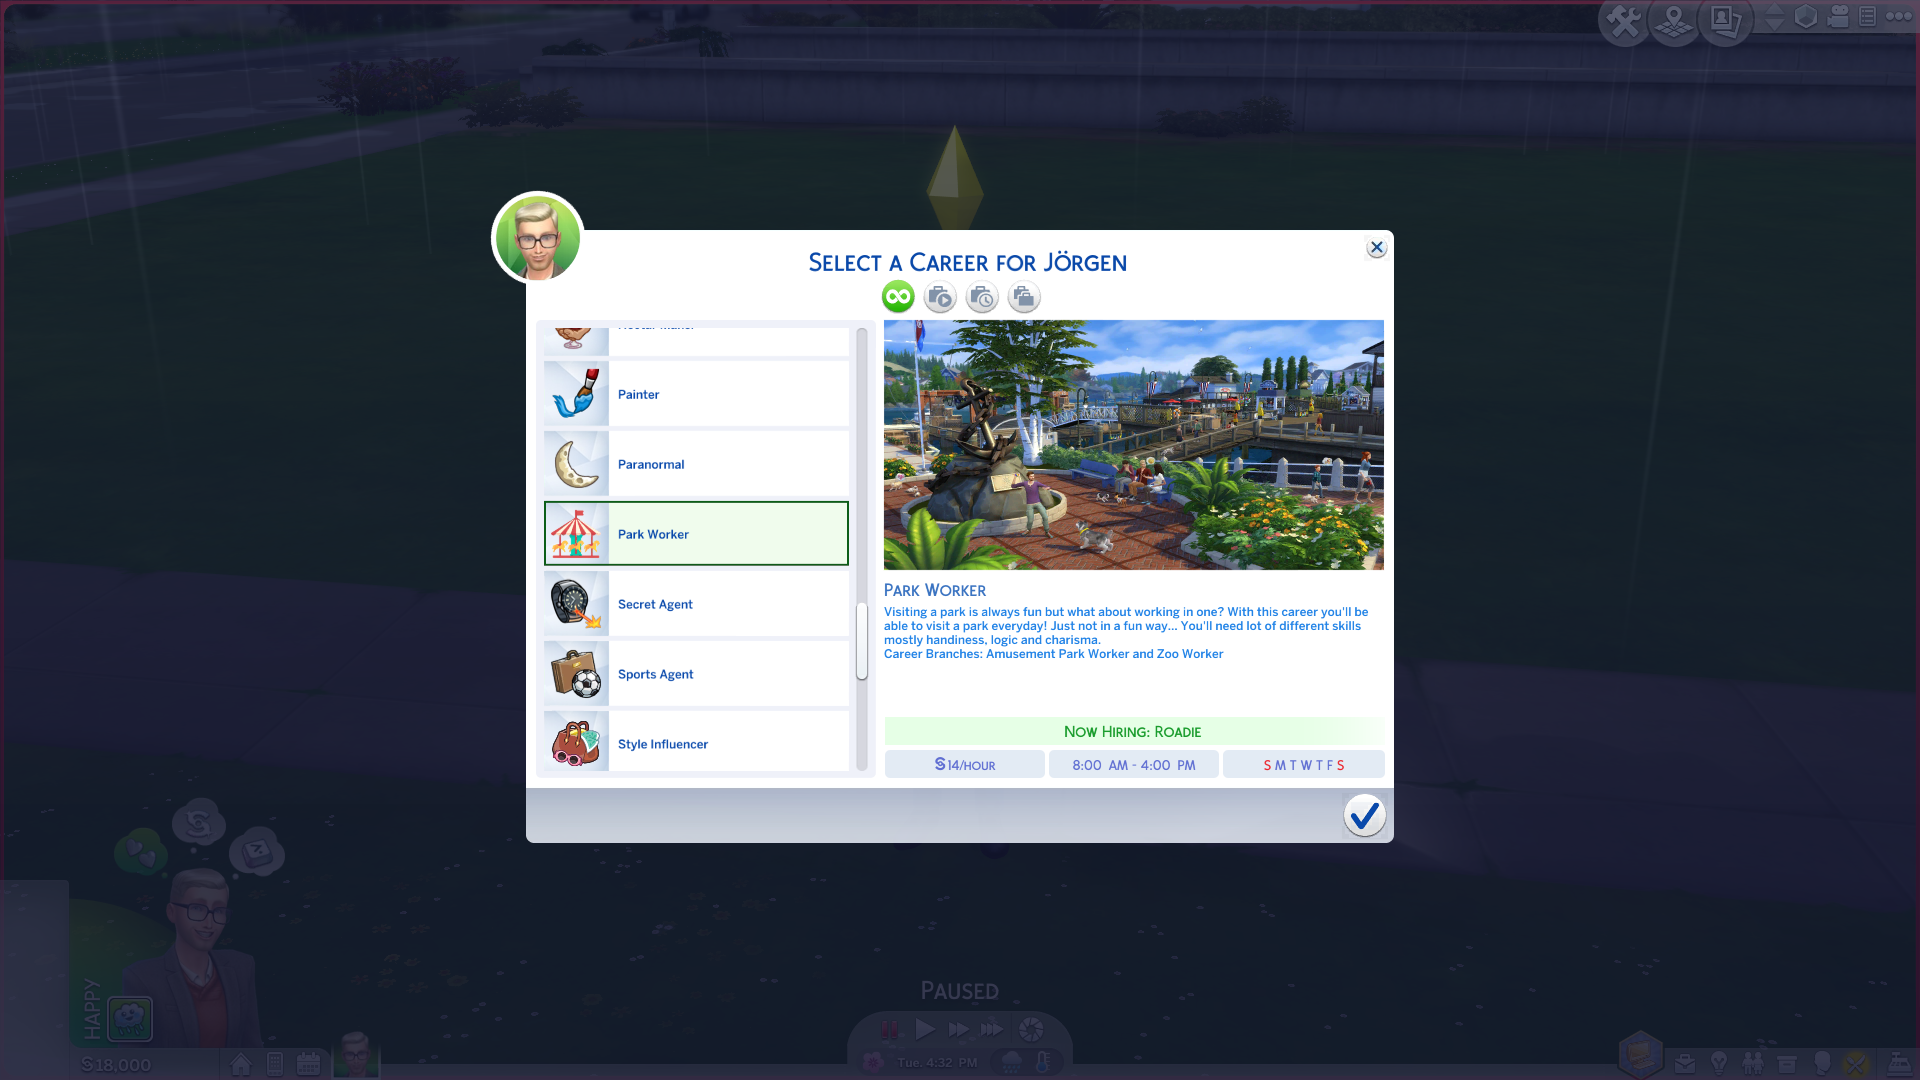 Park Worker Sims career